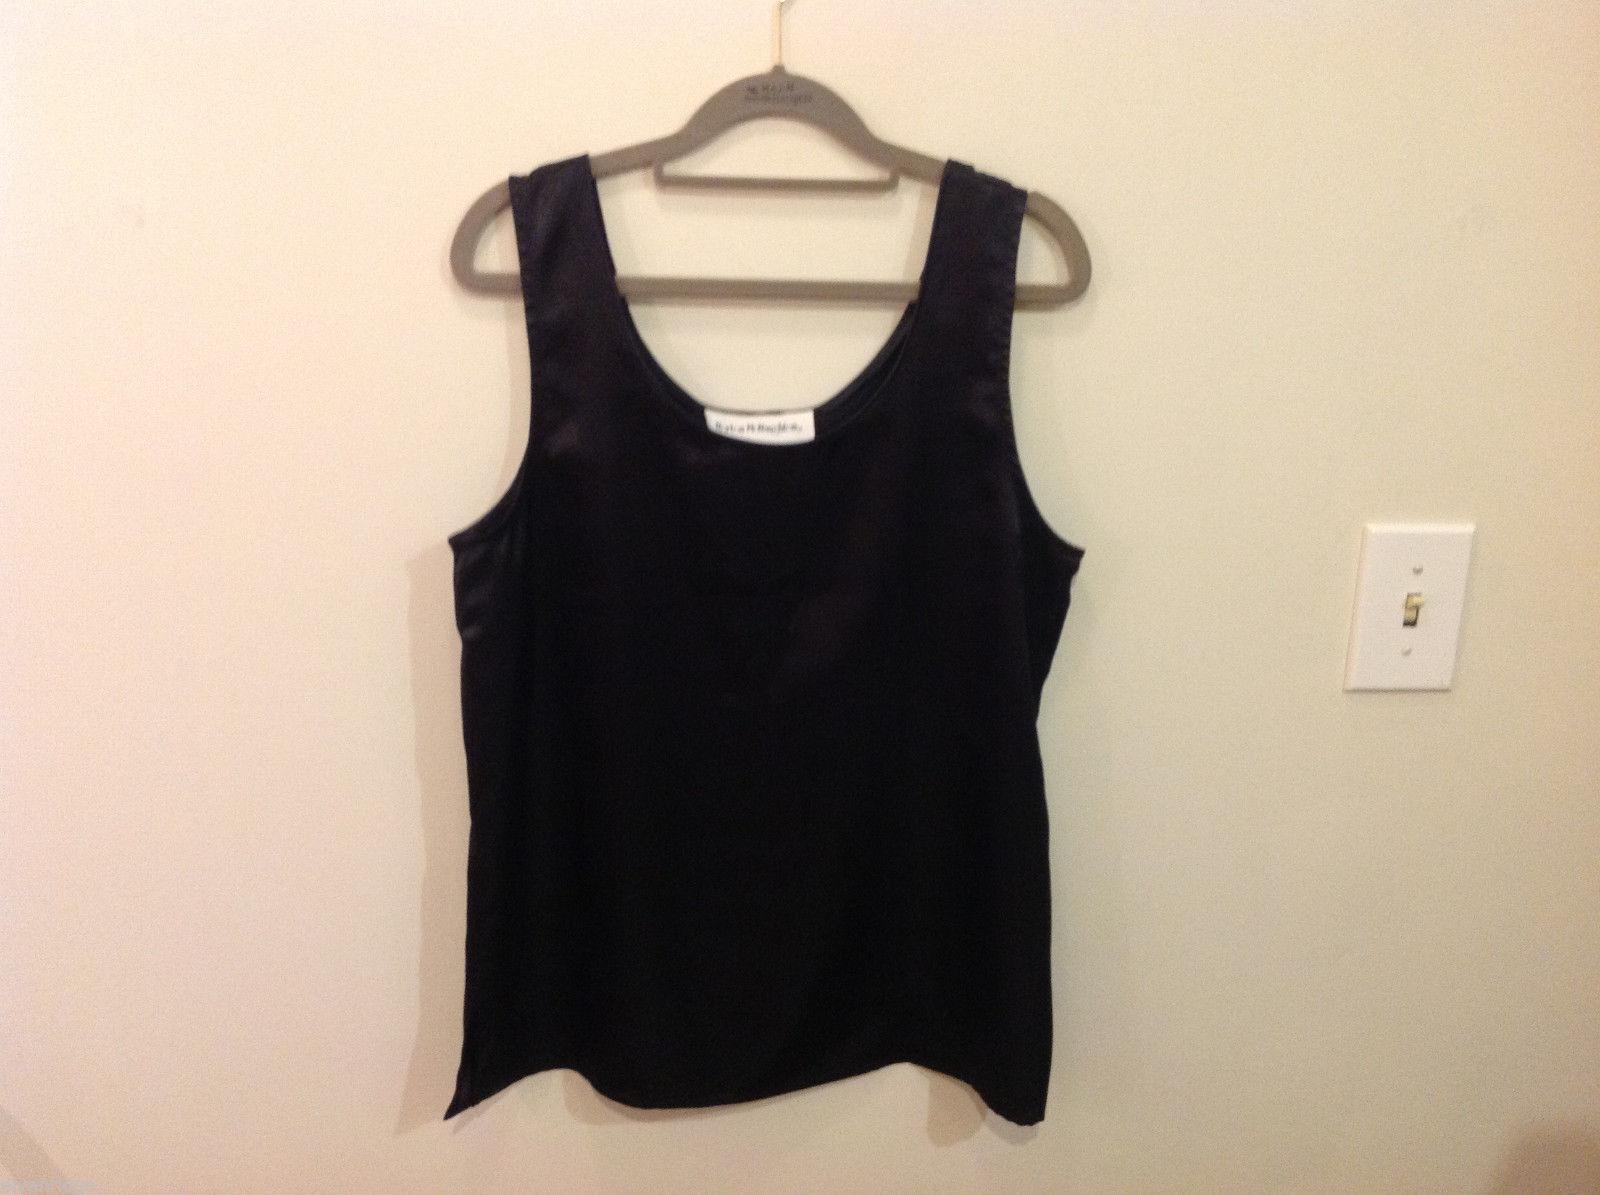 Norton McNaughton Black Sleeveless Silk like Blouse Tank Top, NO Size tag